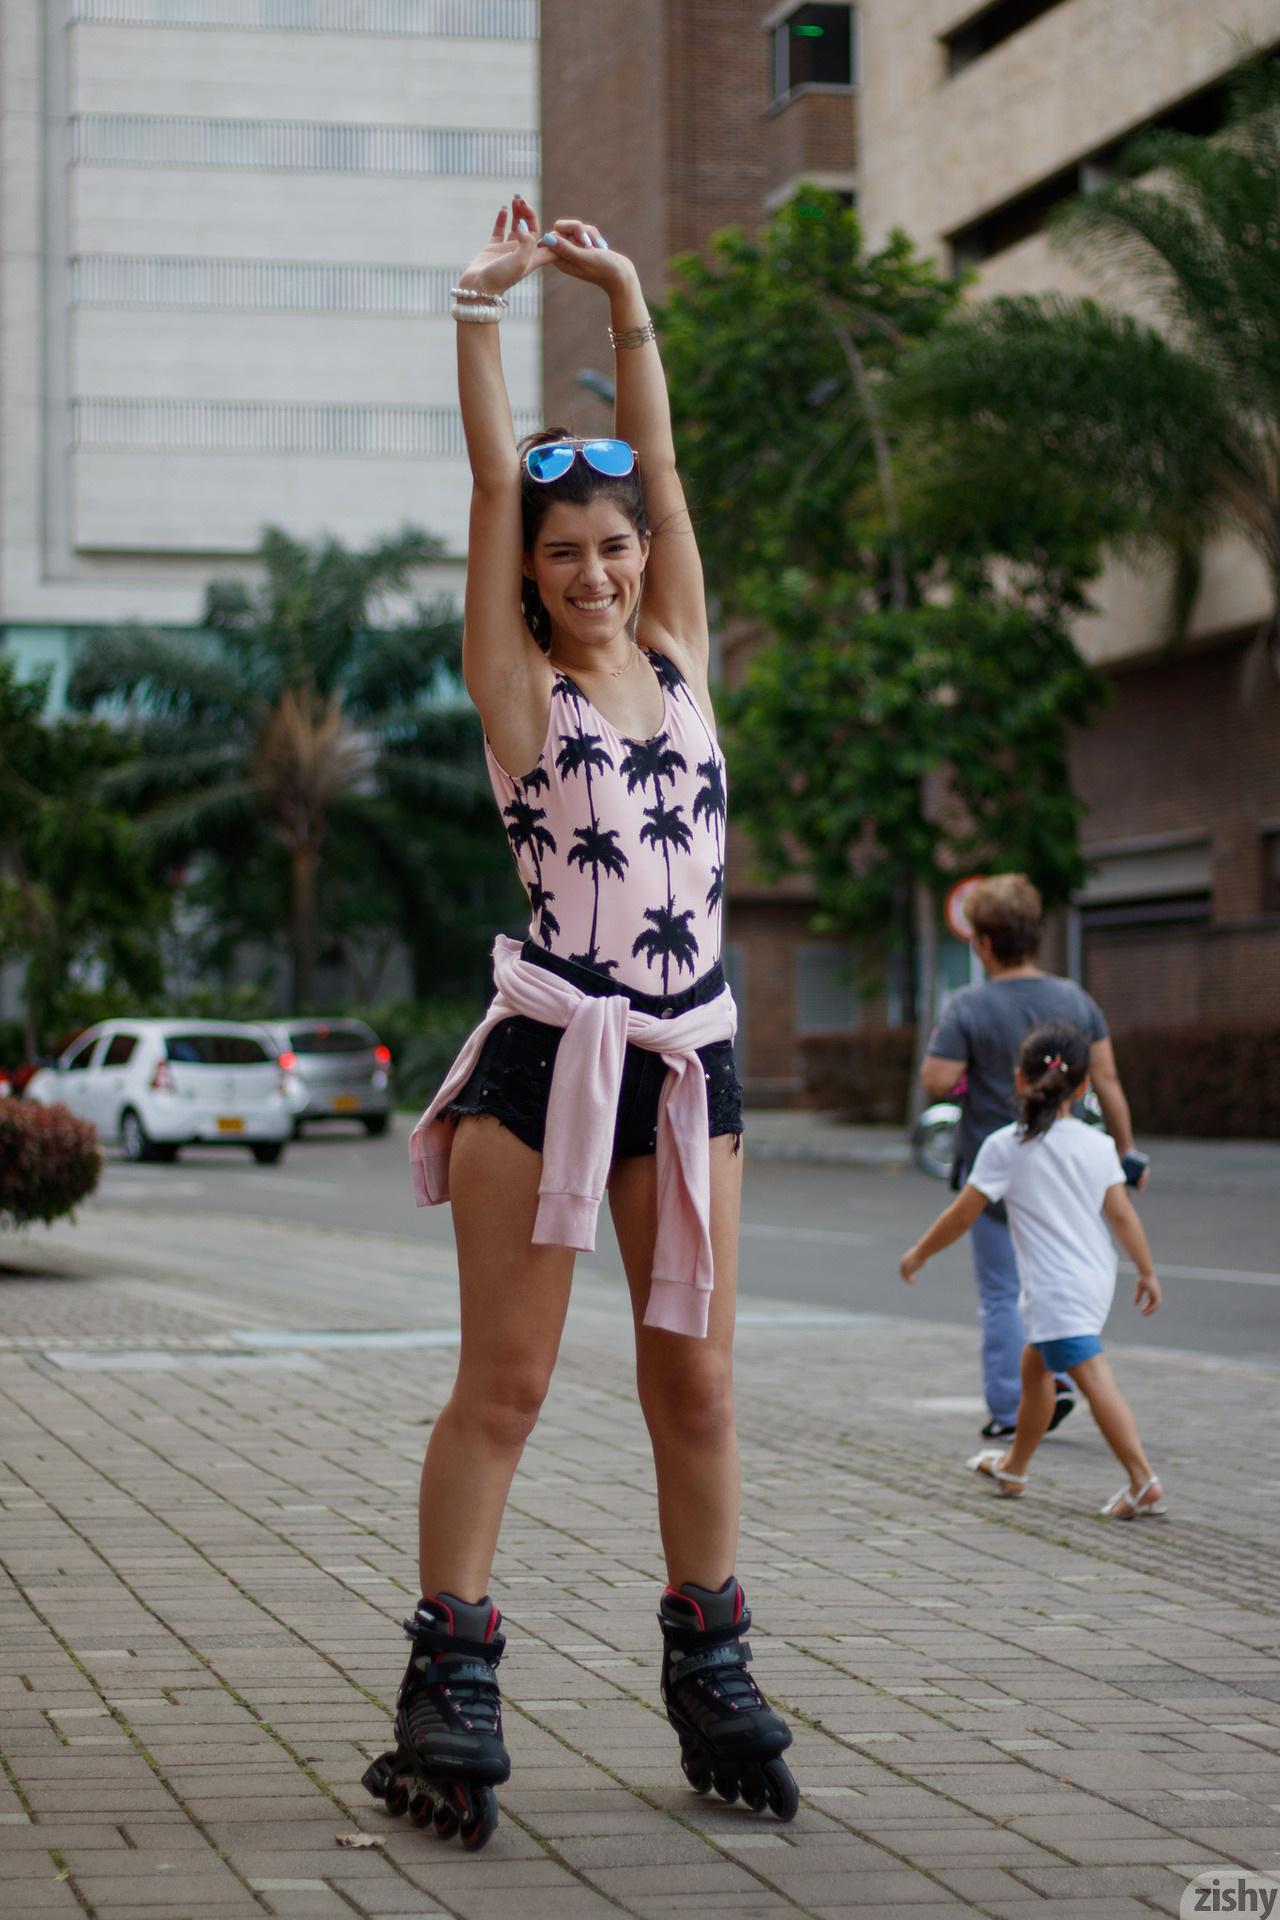 Kate Maze Skates Colombia Zishy (3)